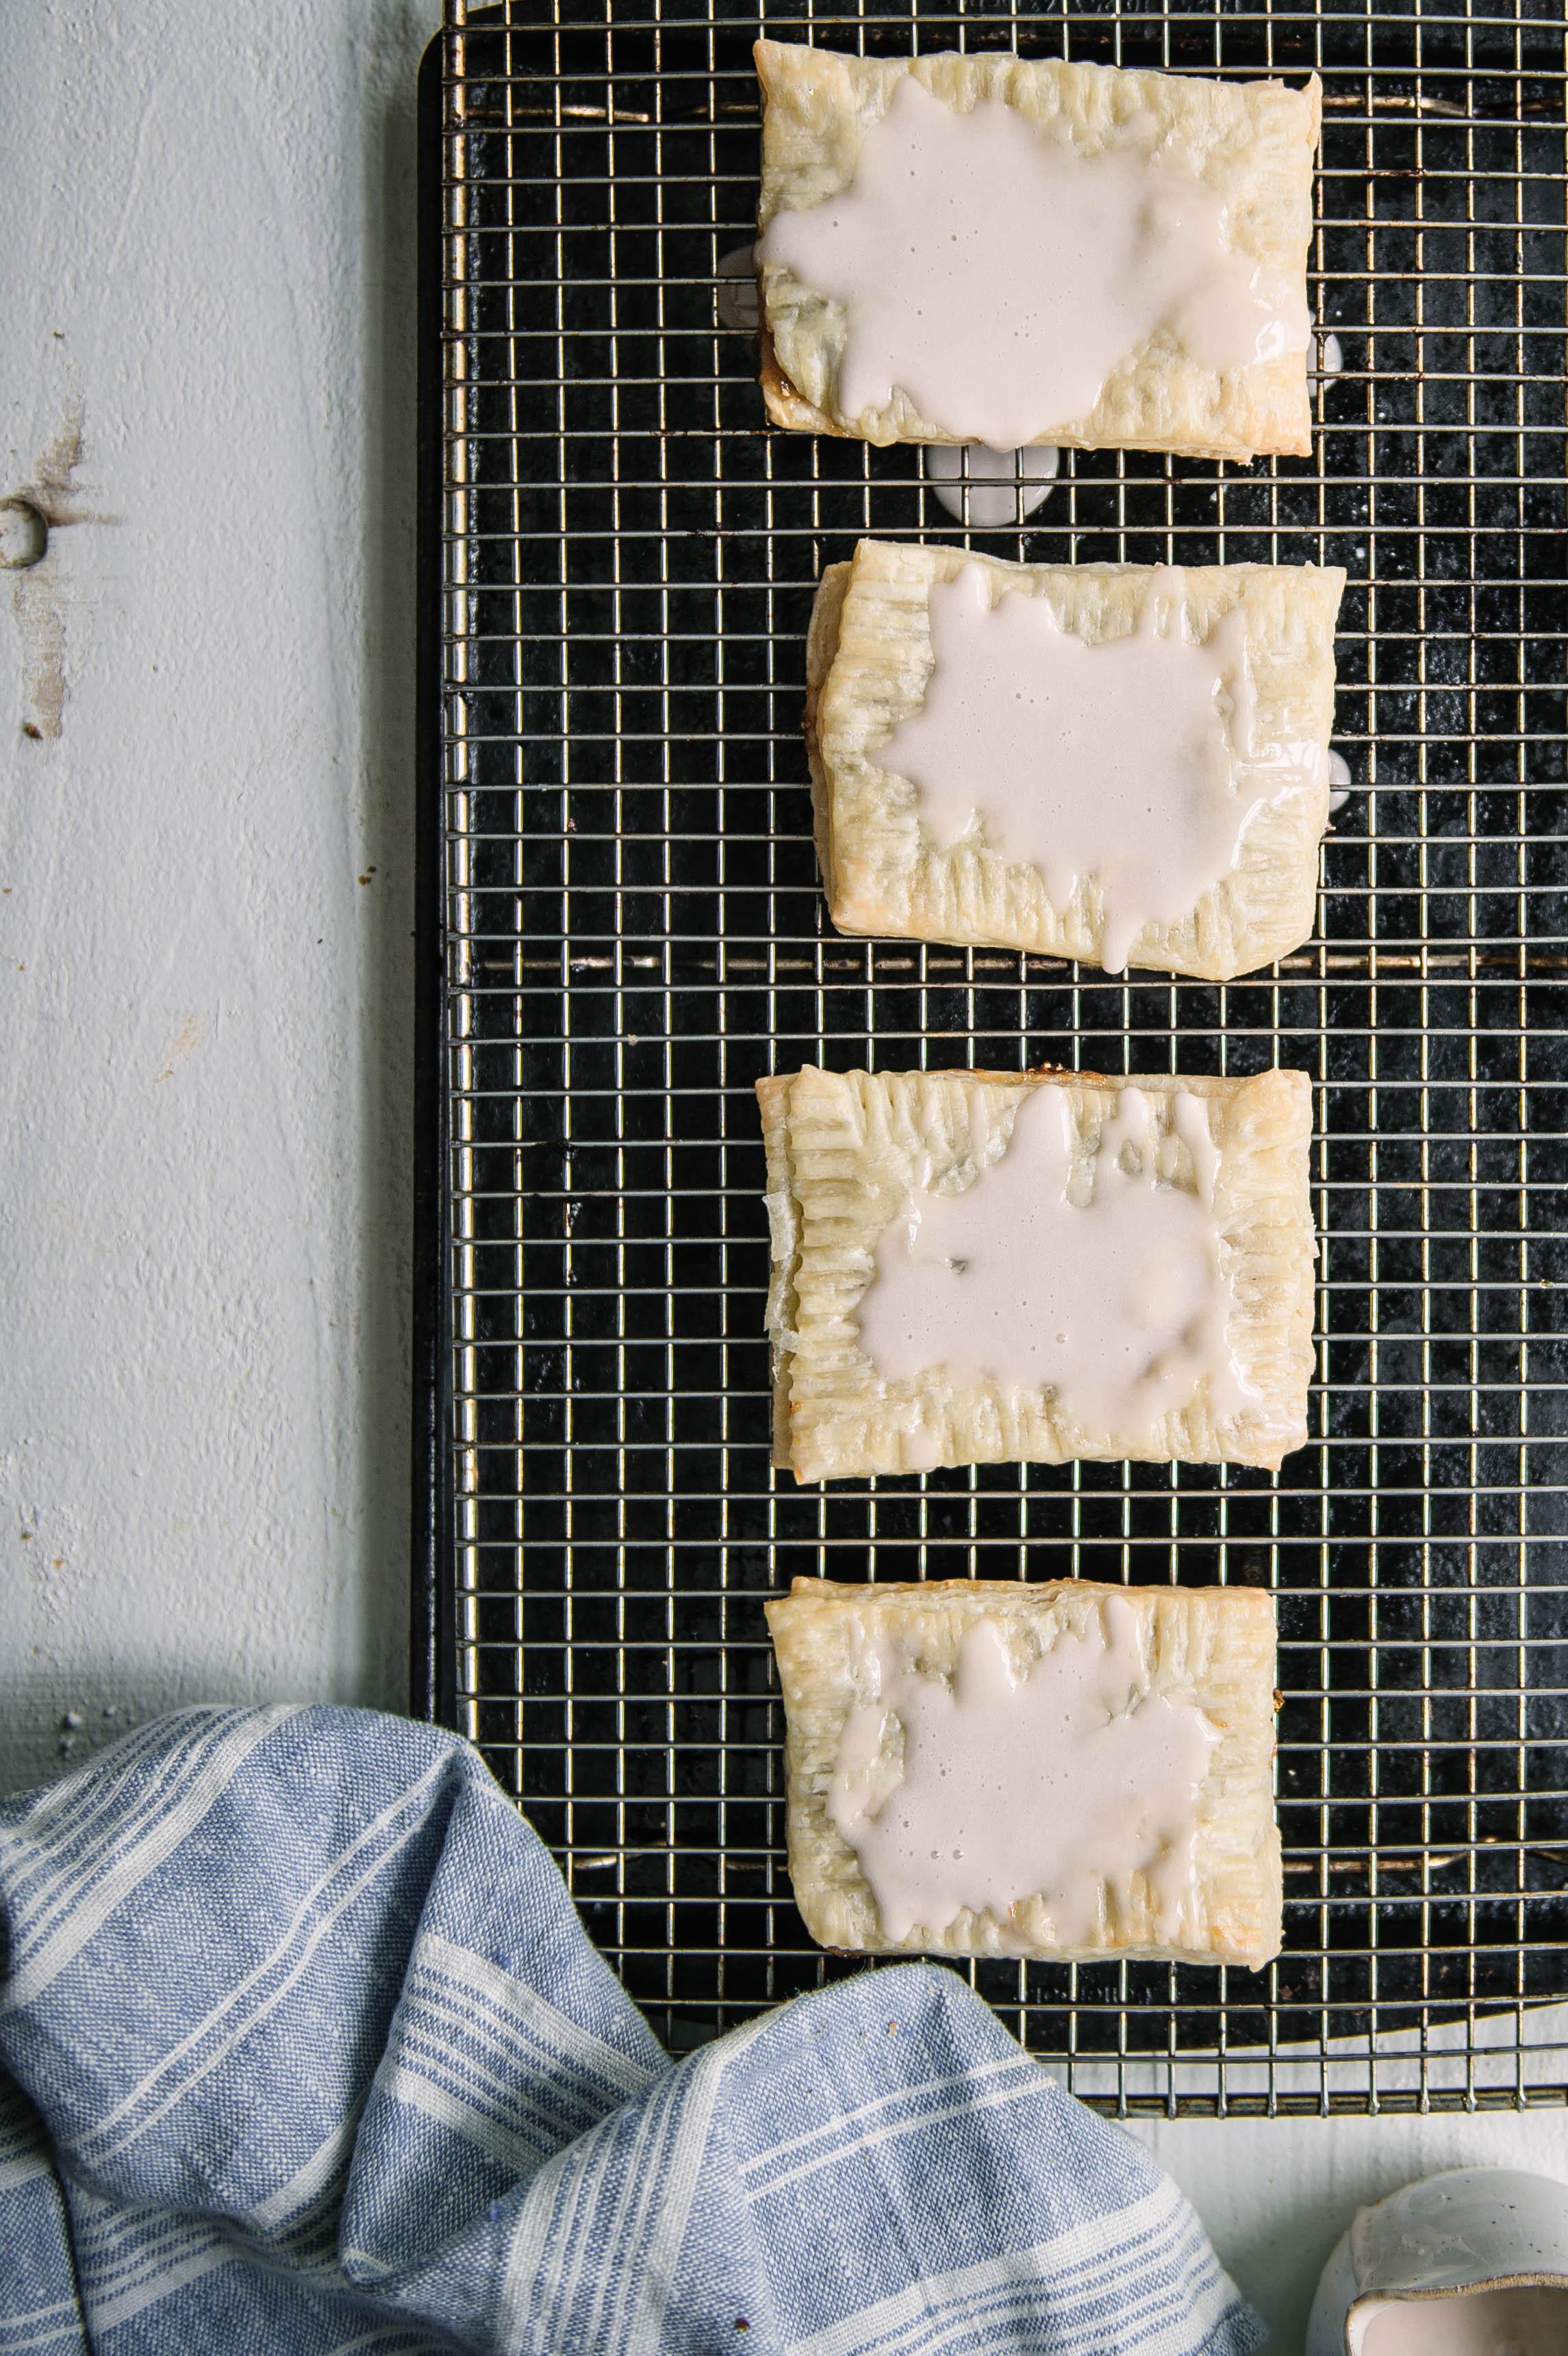 Fig pop tarts